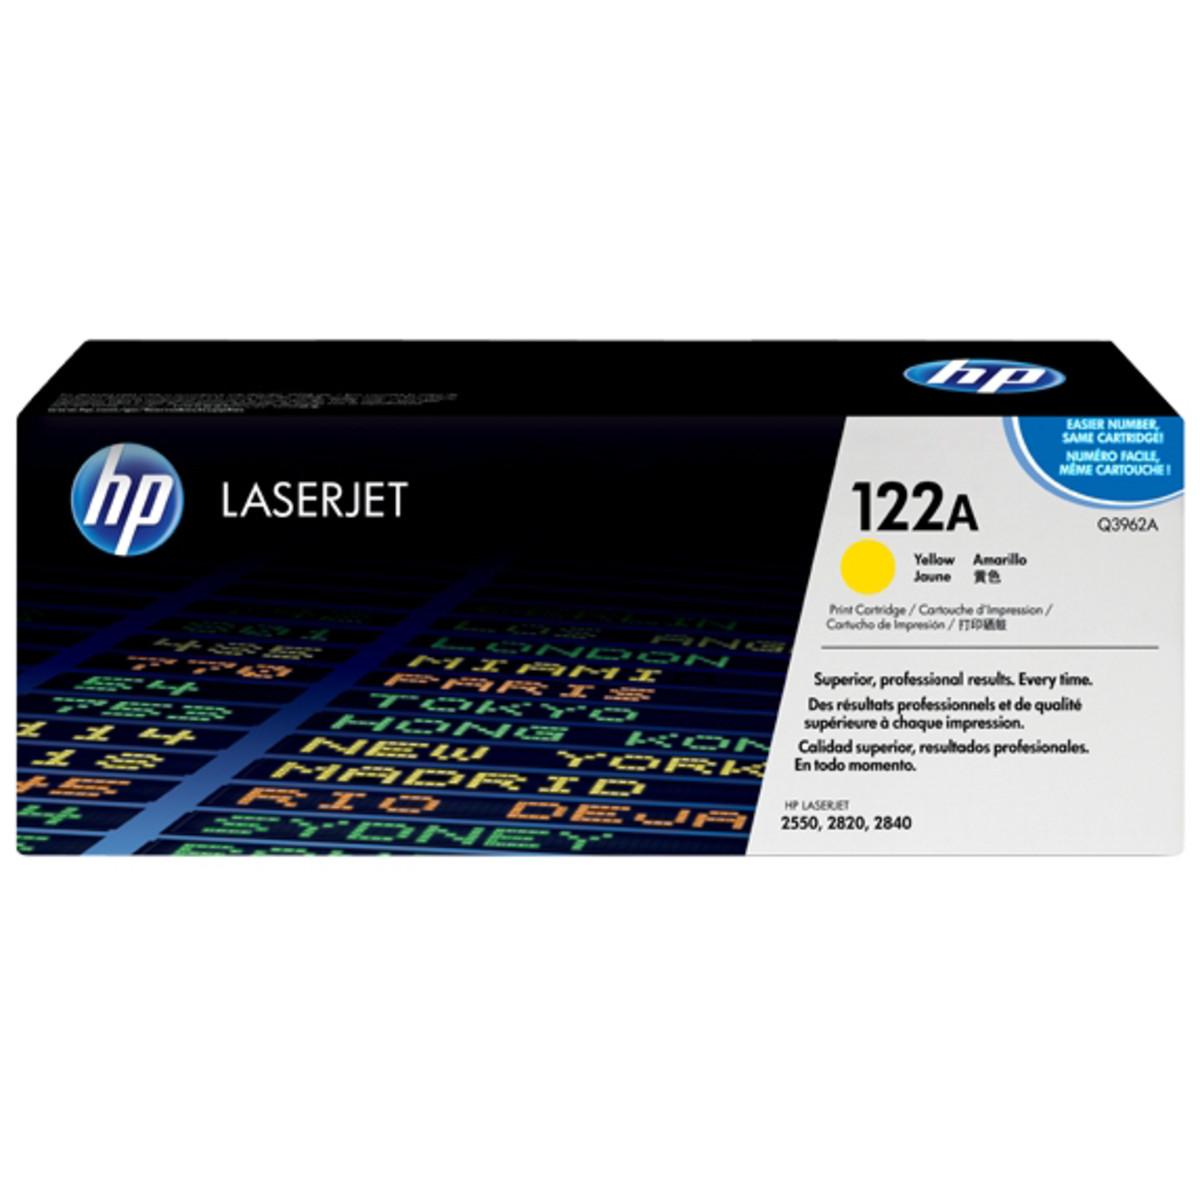 HP 122A (Q3962A) Yellow Toner Cartridge - High Yield